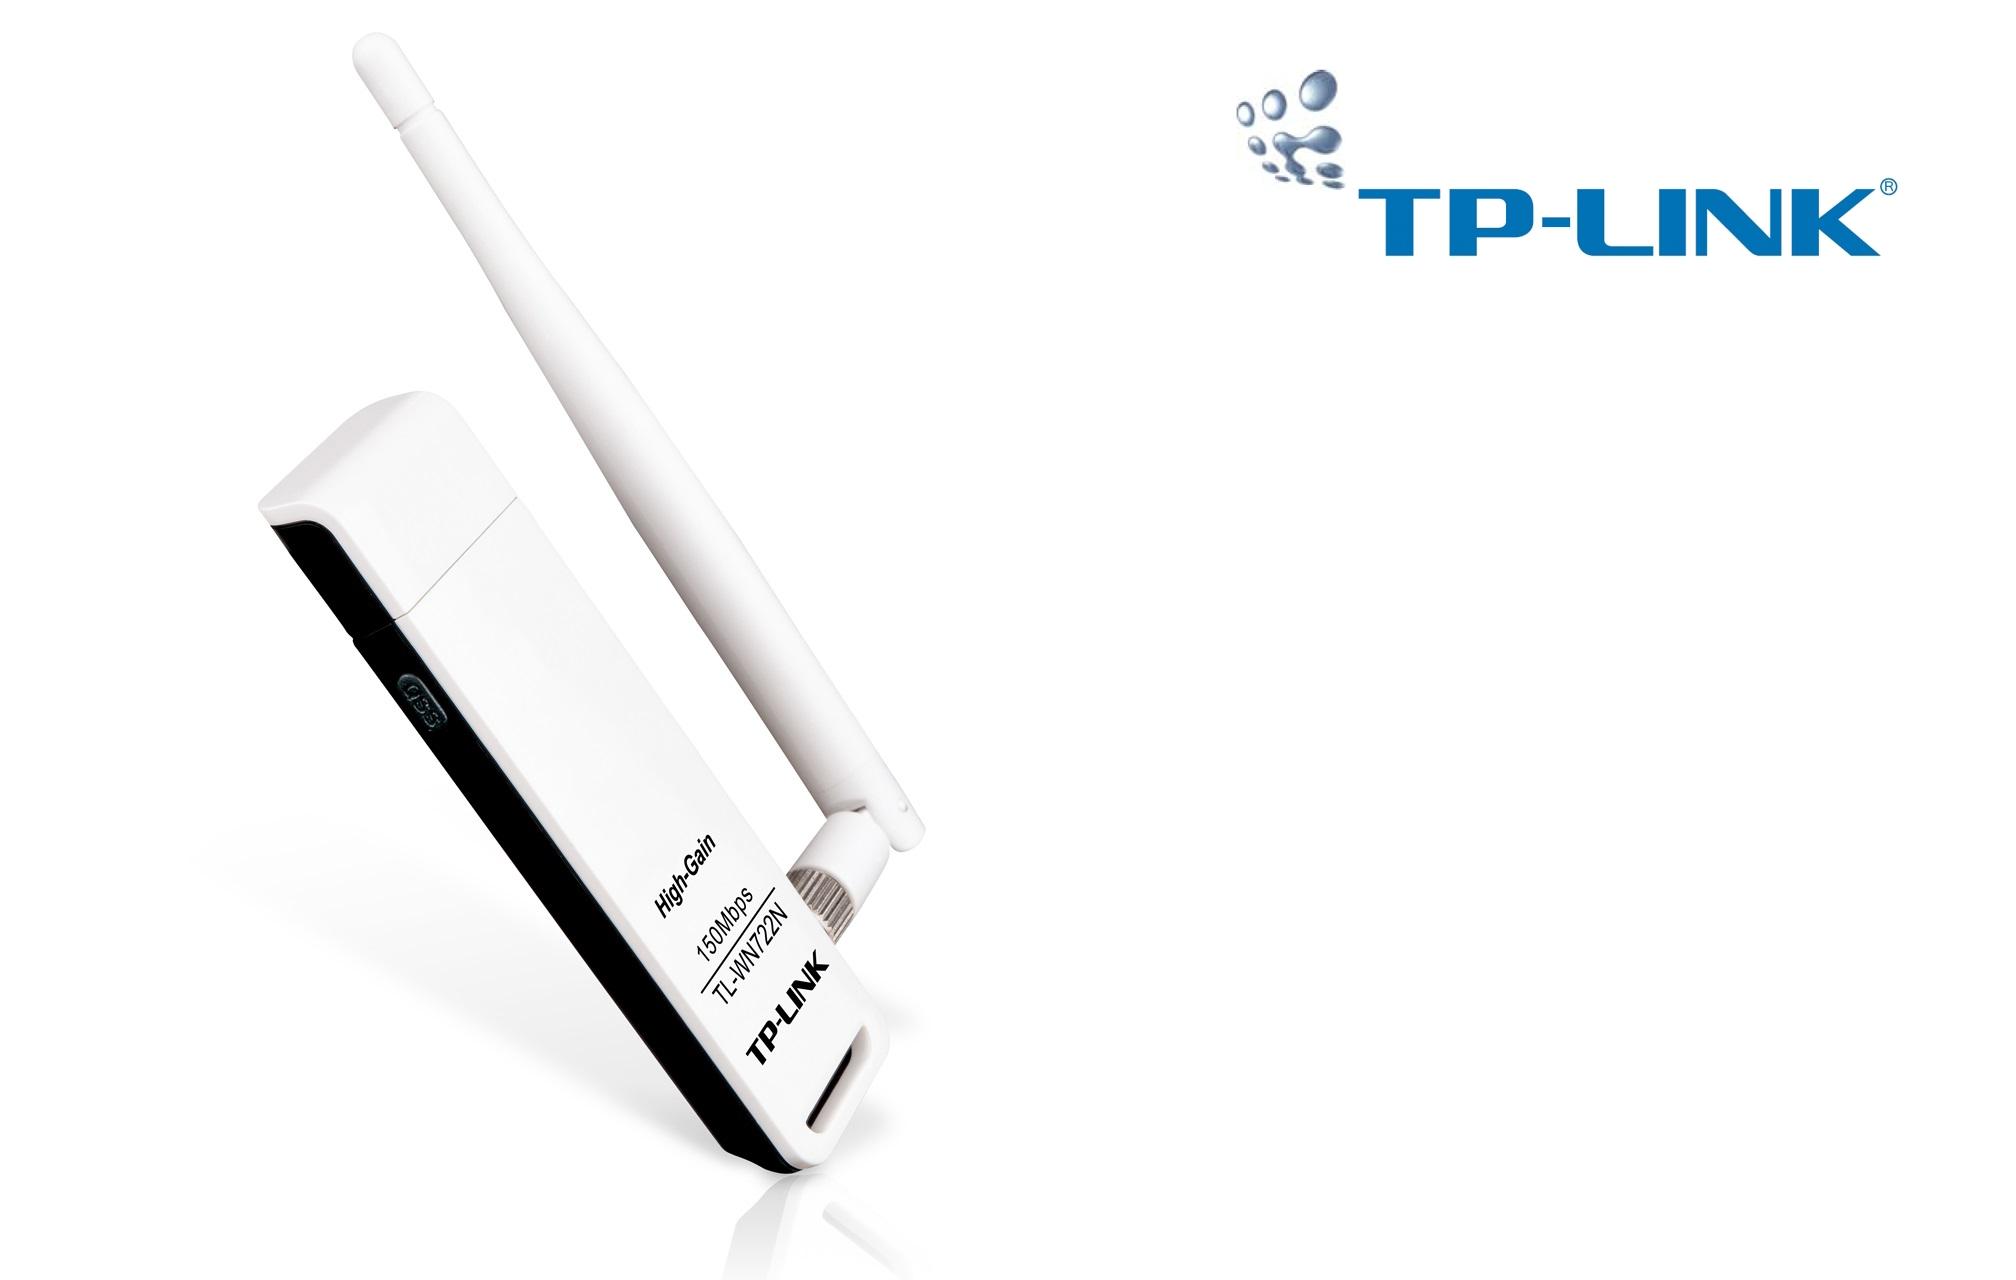 TP-LINK TL-WN722N